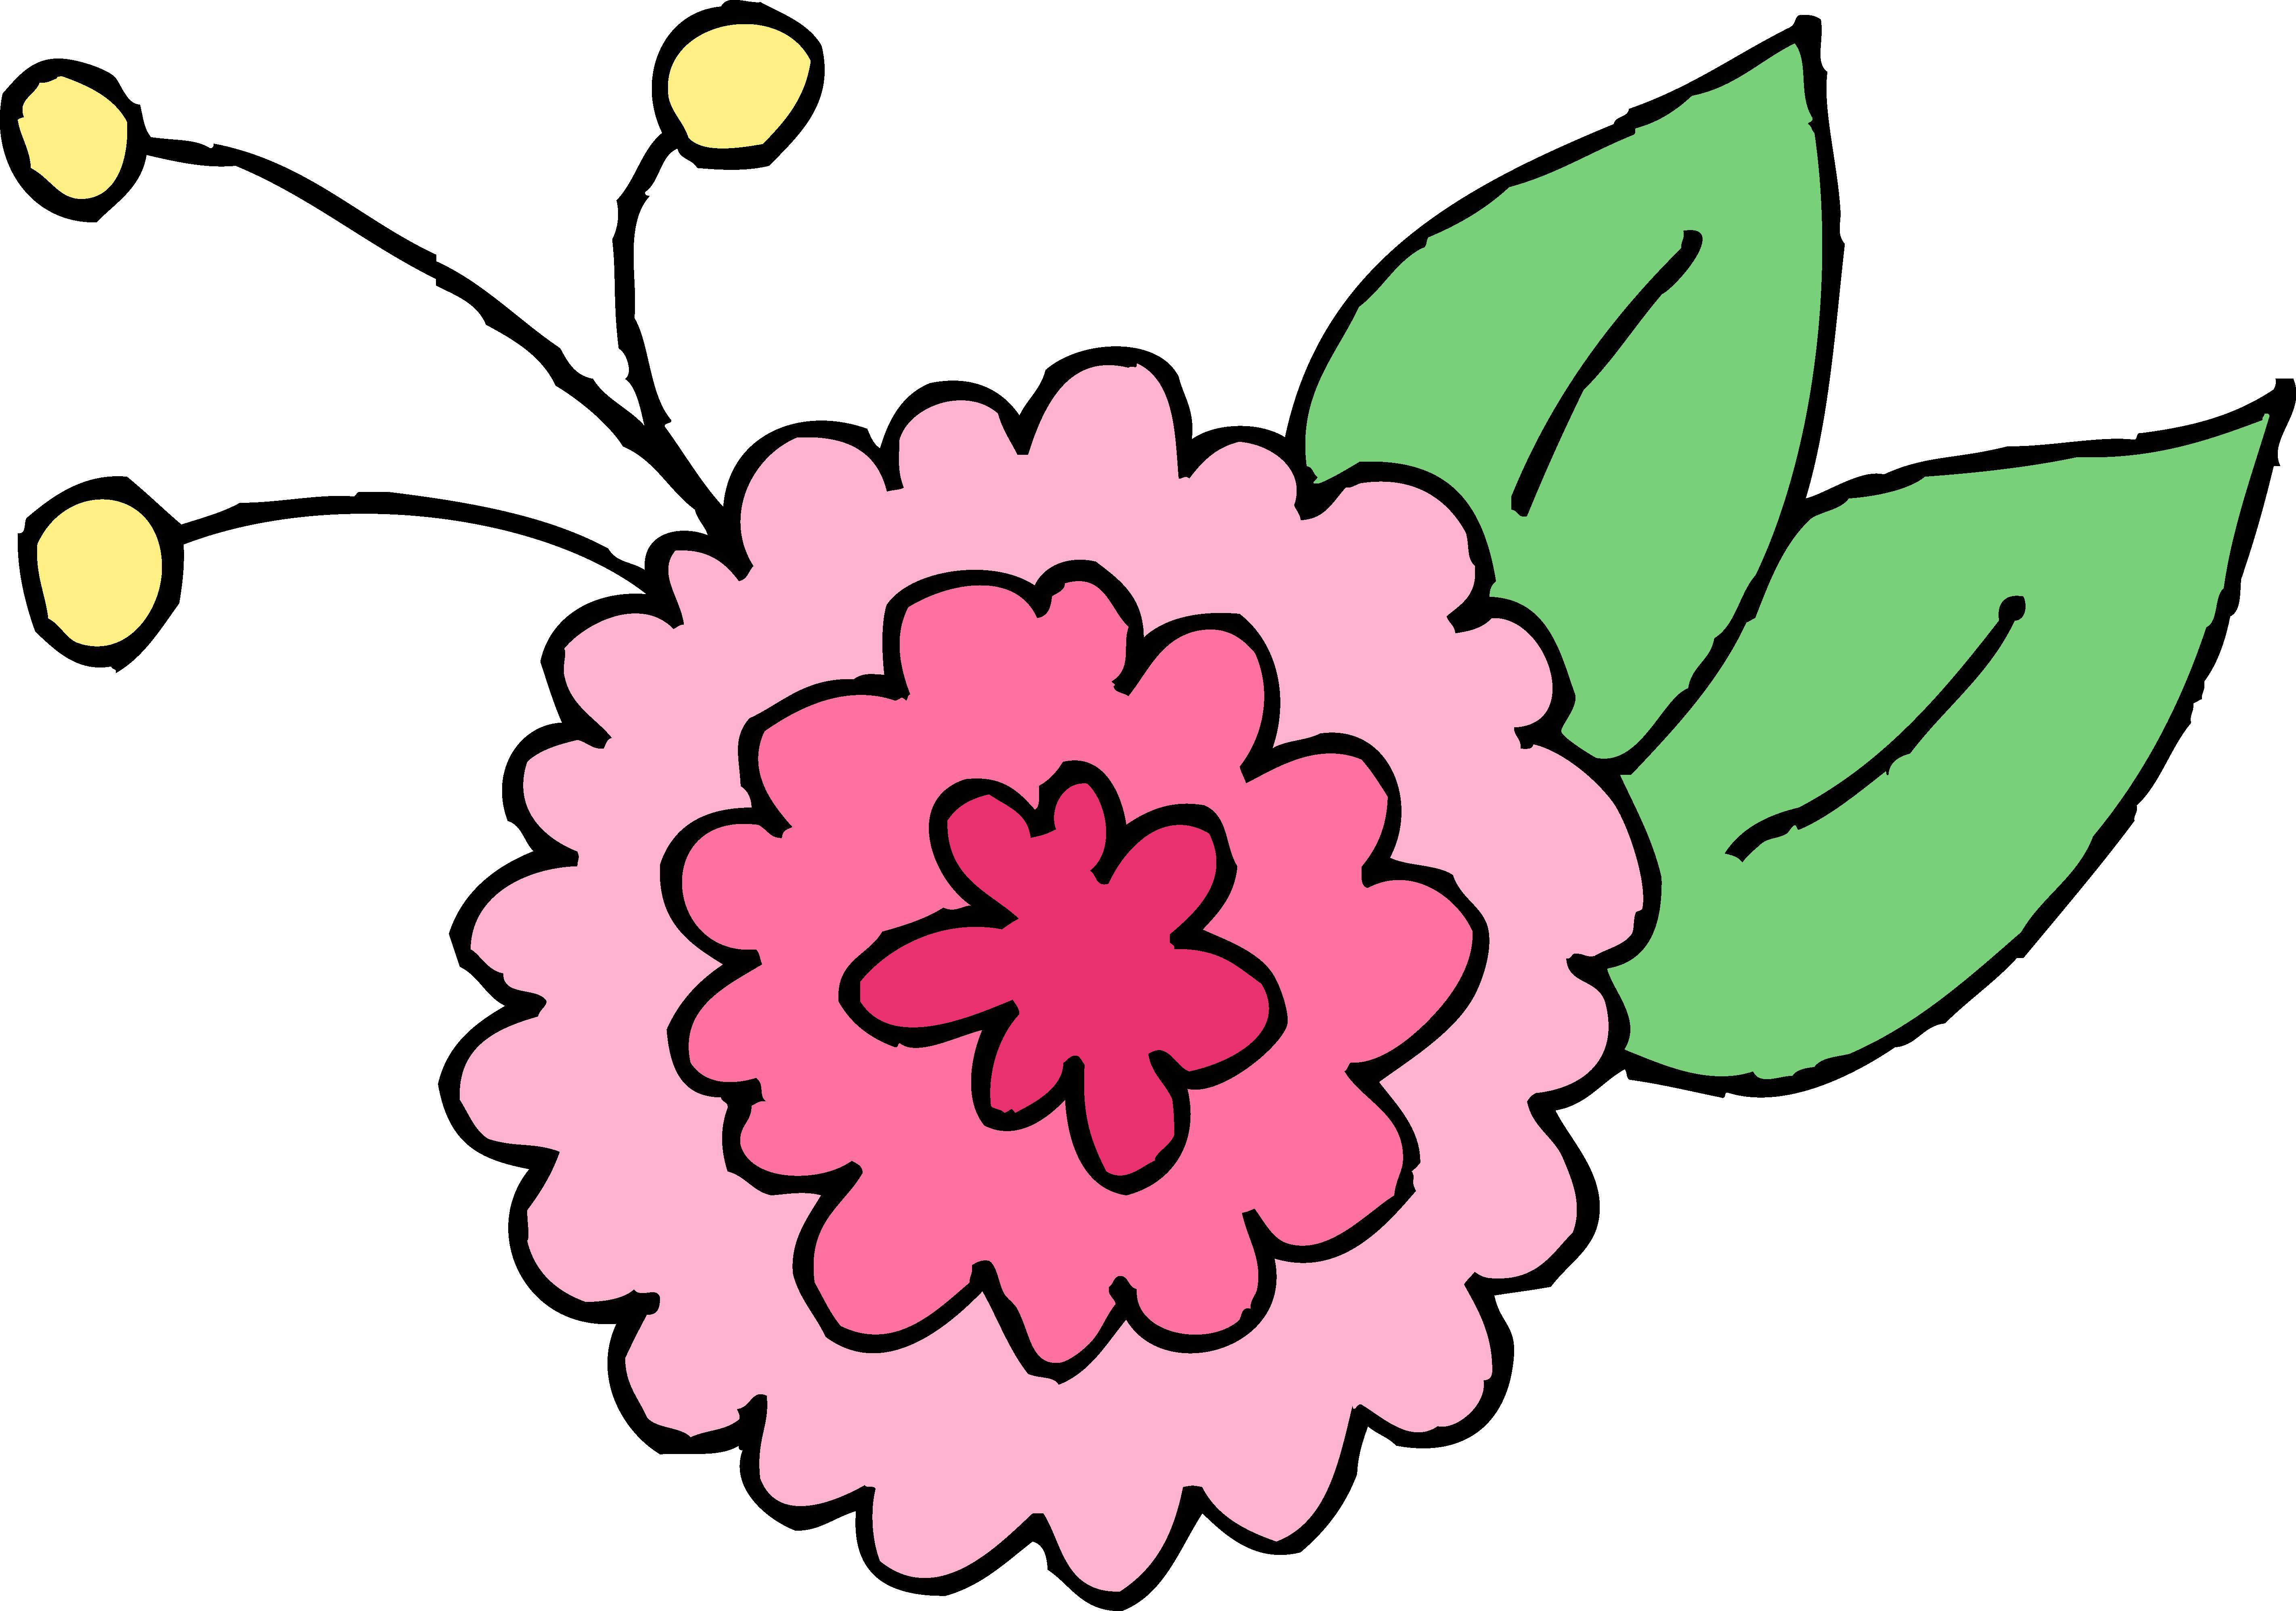 Free clipart chrysanthemum. Cute pink flower clip